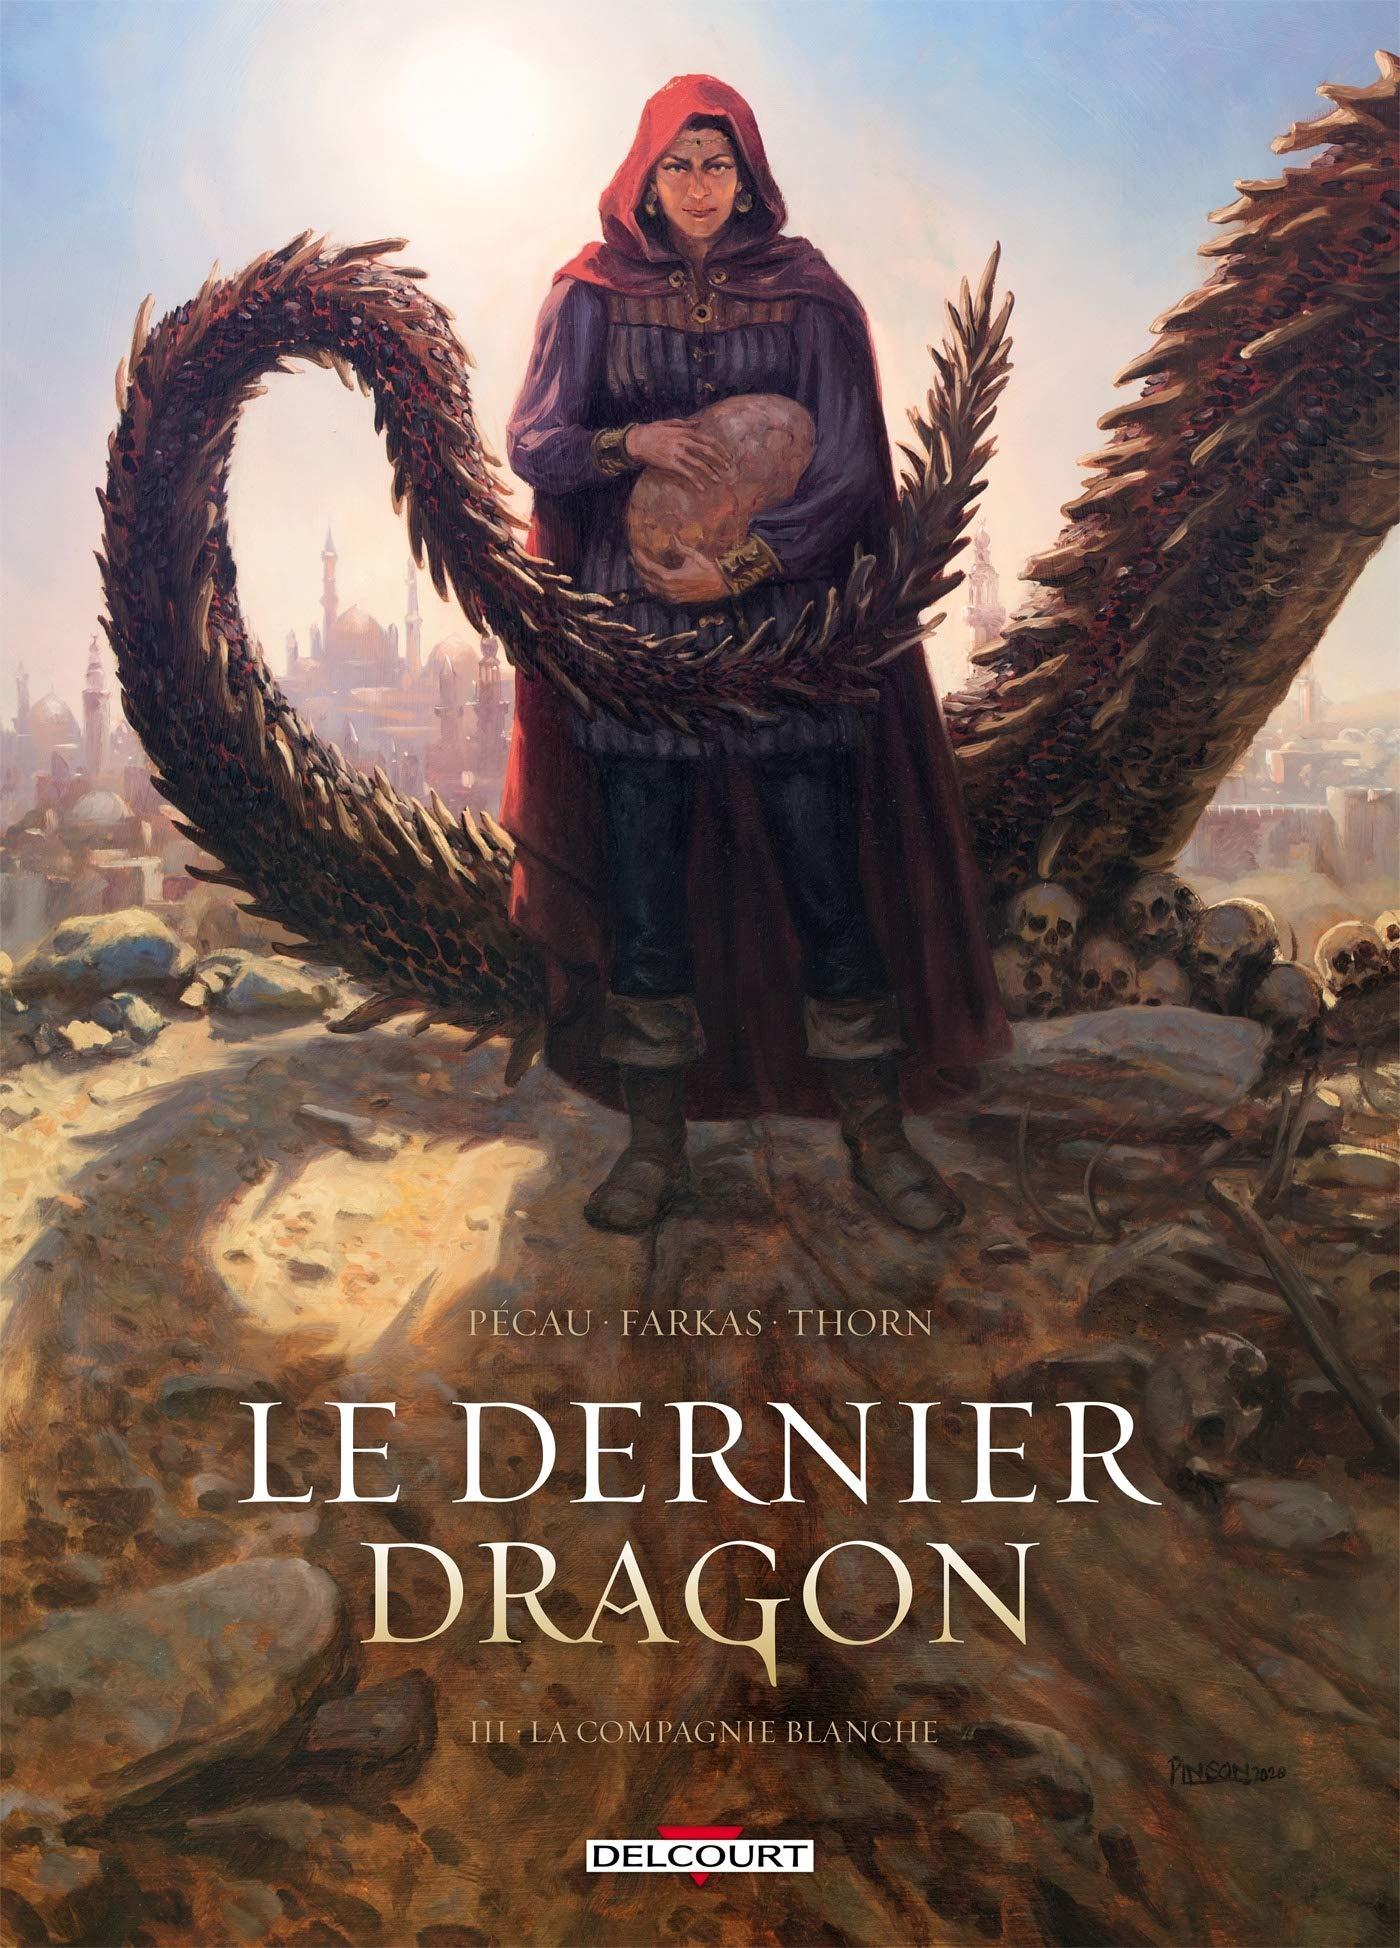 Le dernier dragon 3 - La compagnie blanche